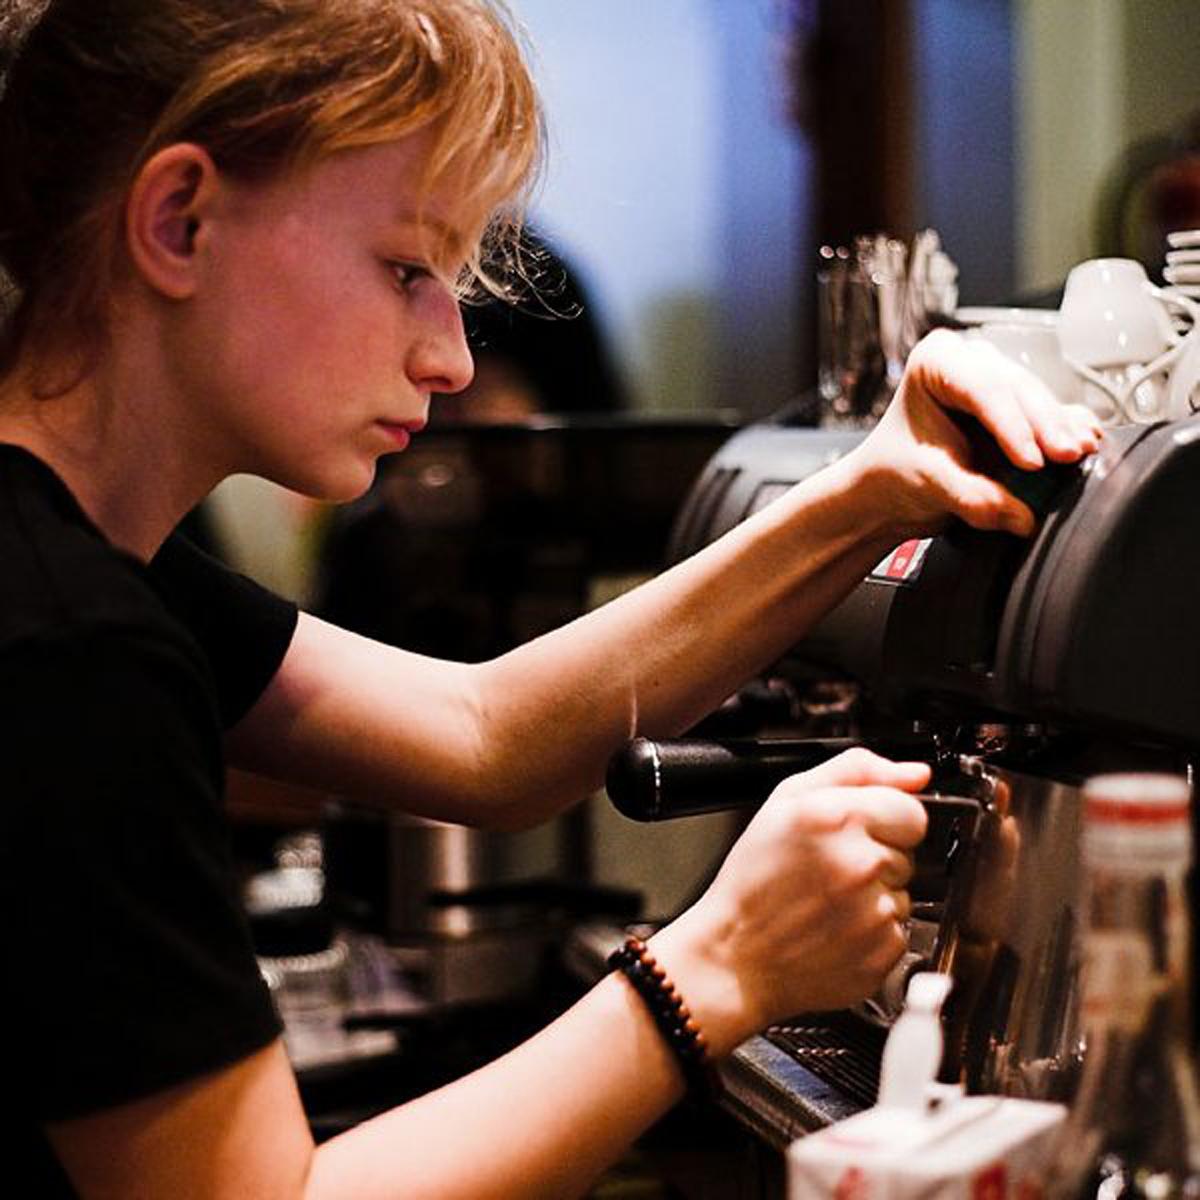 Barista Coffee In Rome, Italy